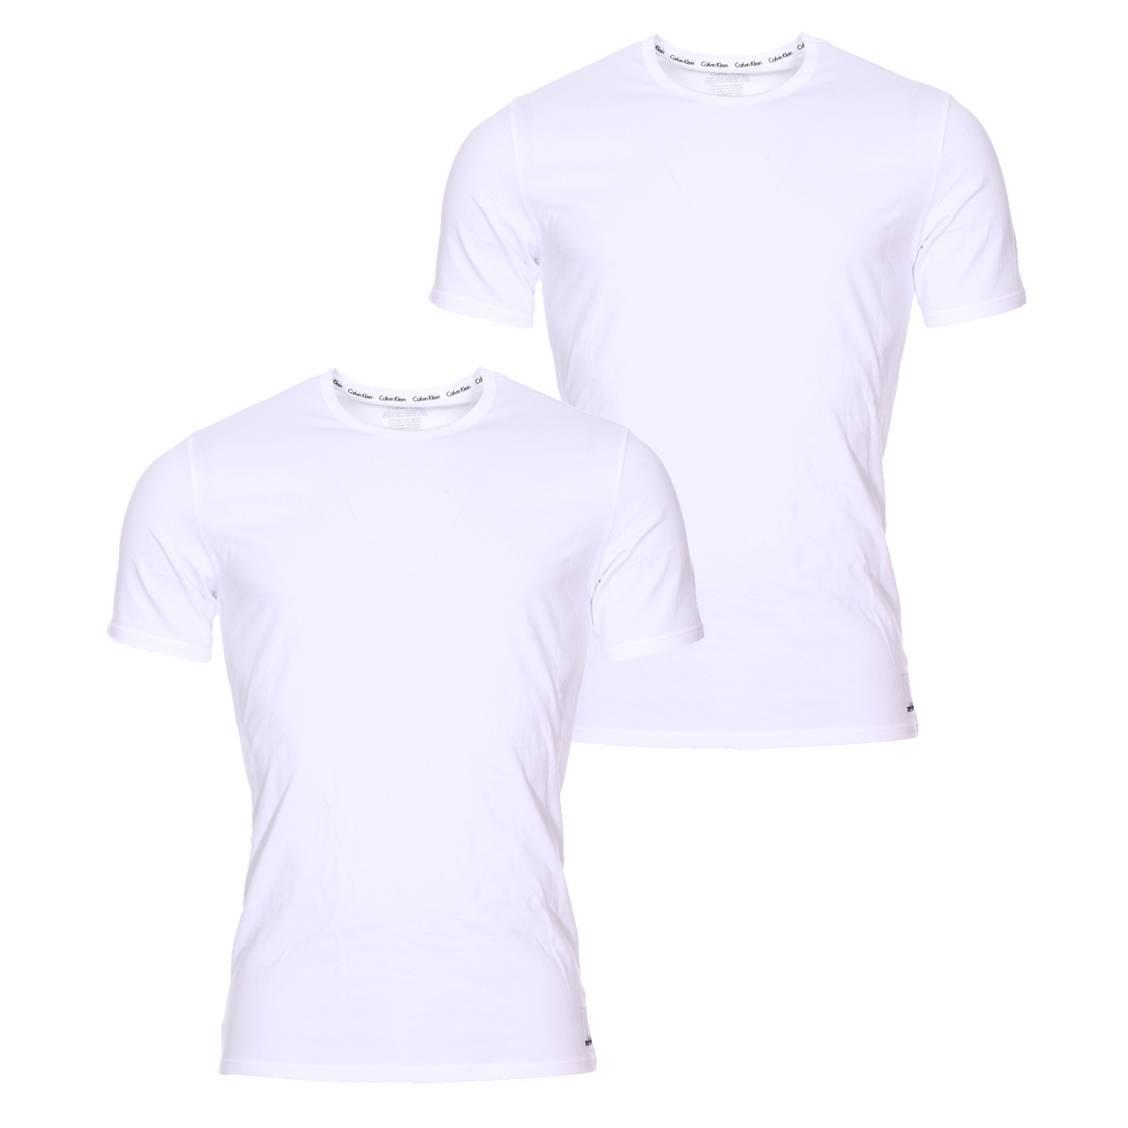 Lot de 2 tee-shirts col rond calvin klein en coton stretch blanc